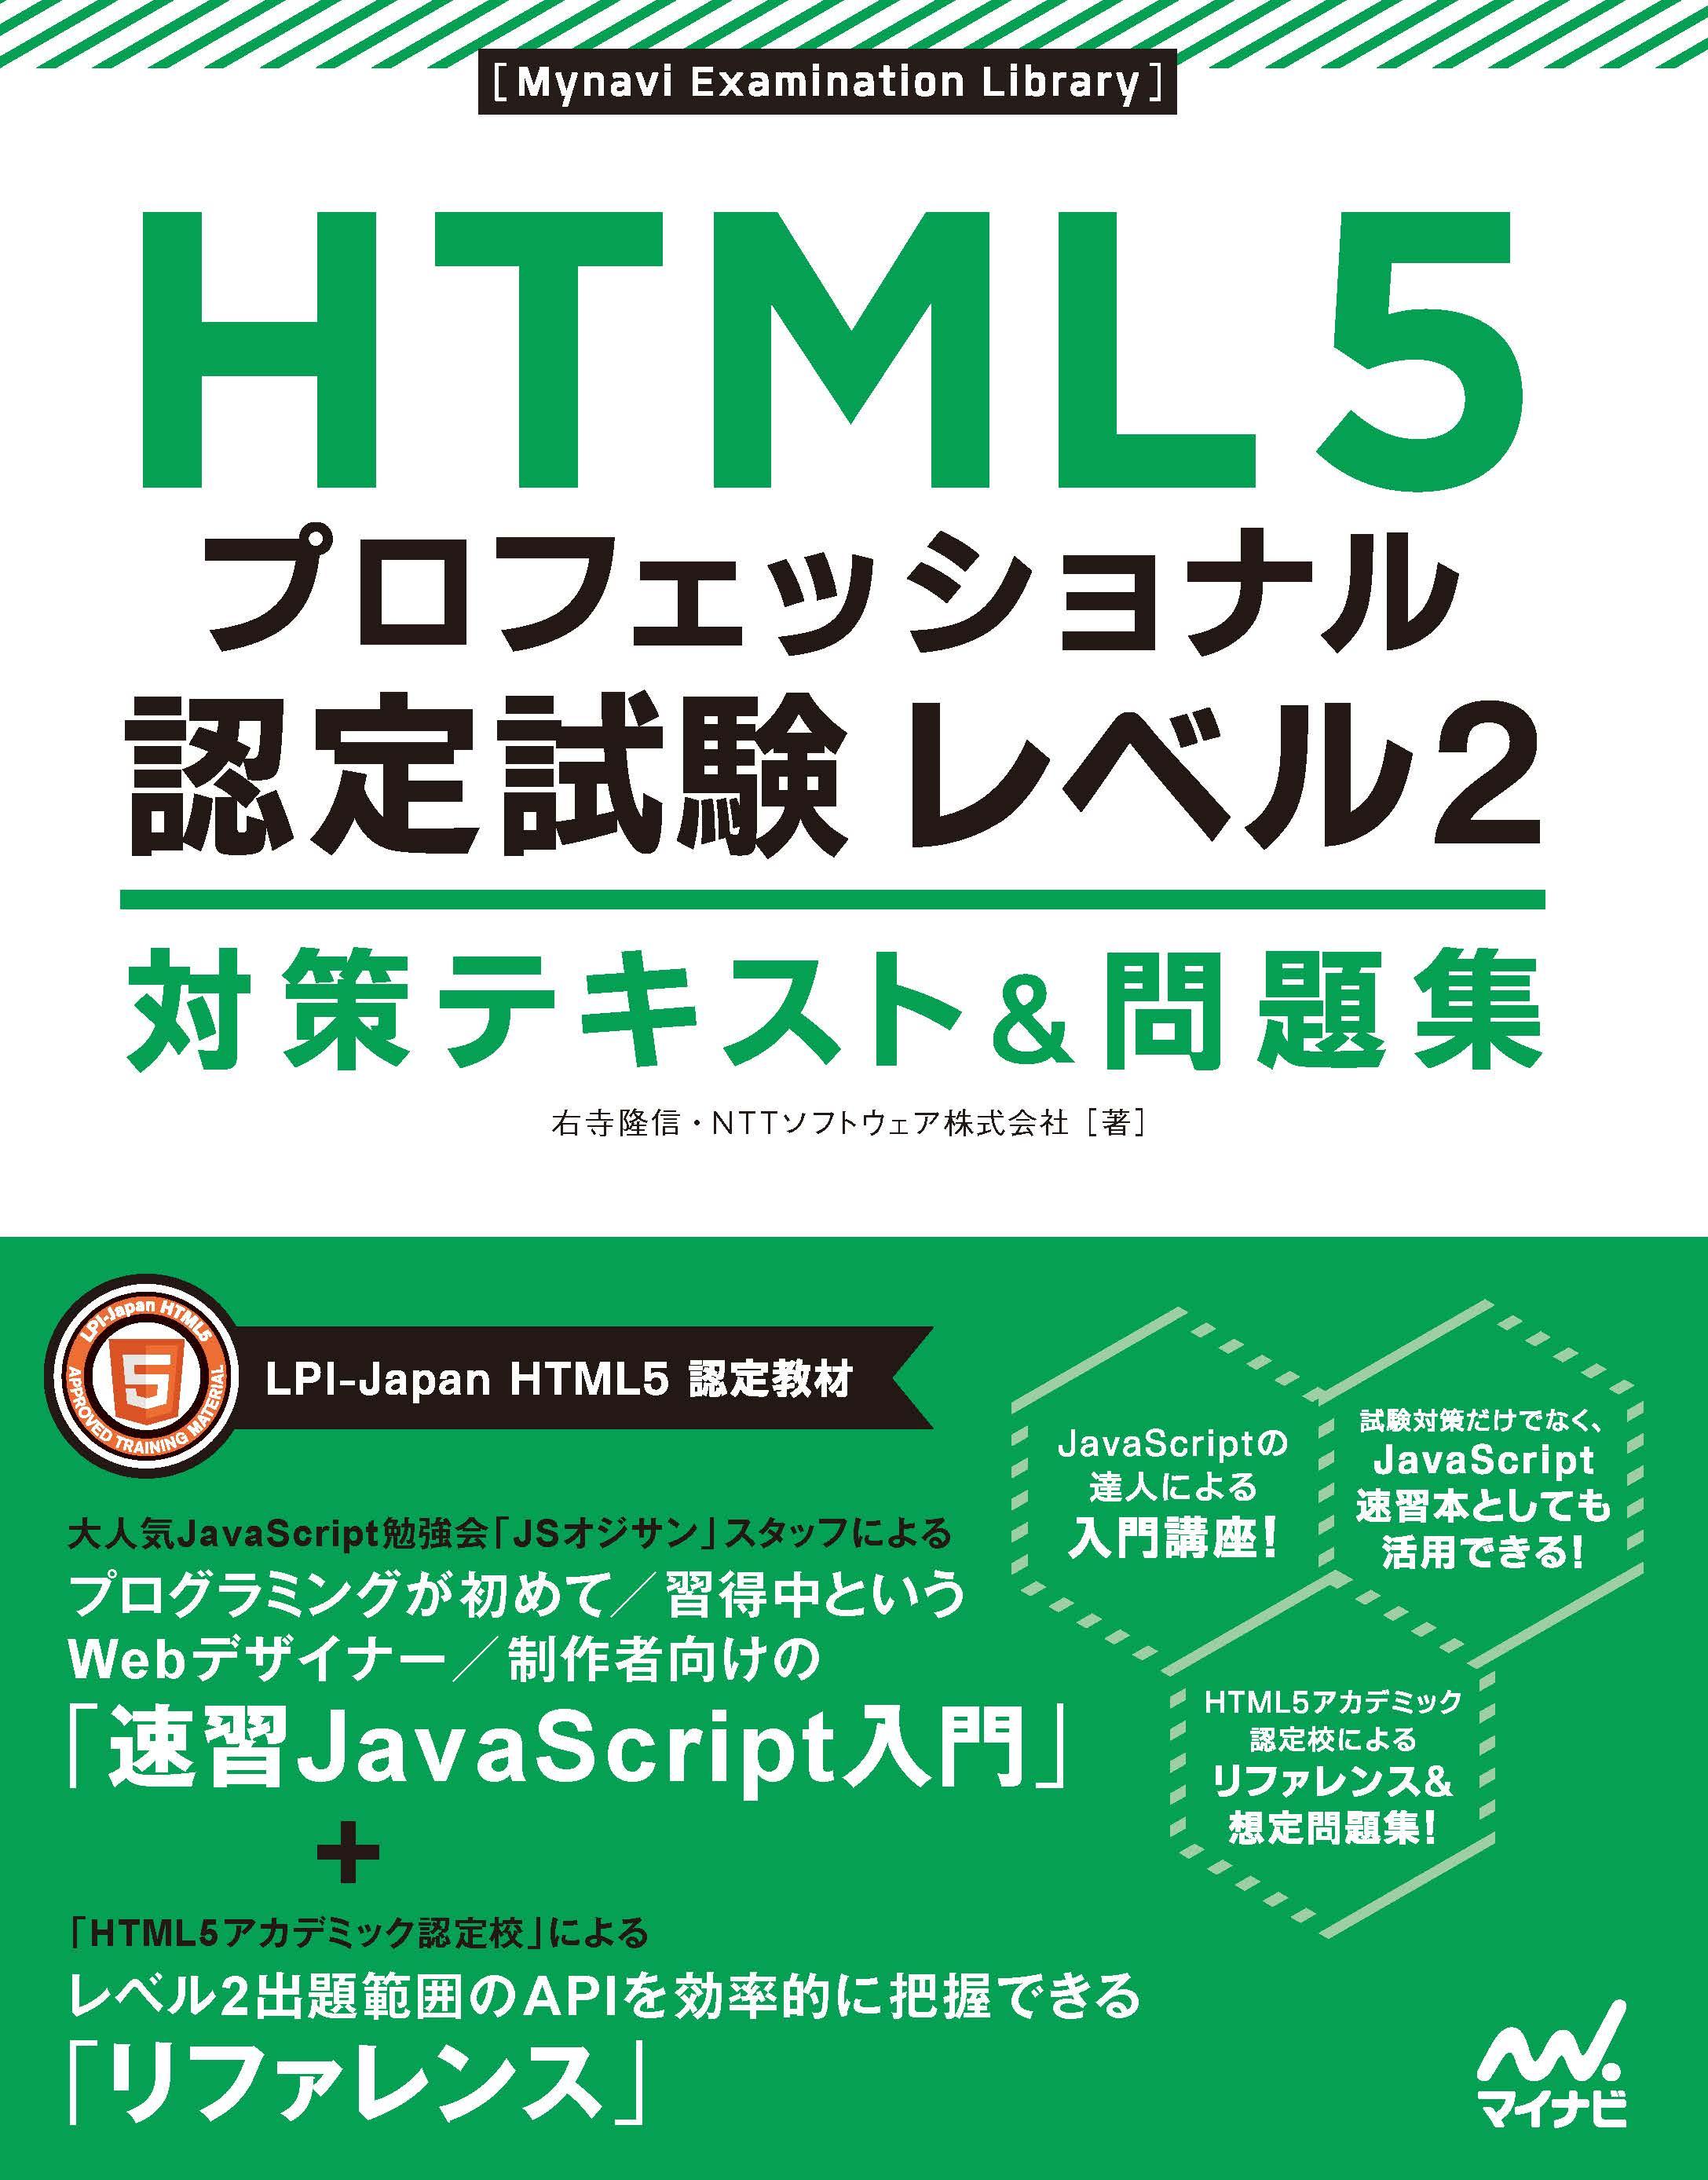 HTML5プロフェッショナル認定試験 レベル2 対策テキスト&問題集の写真